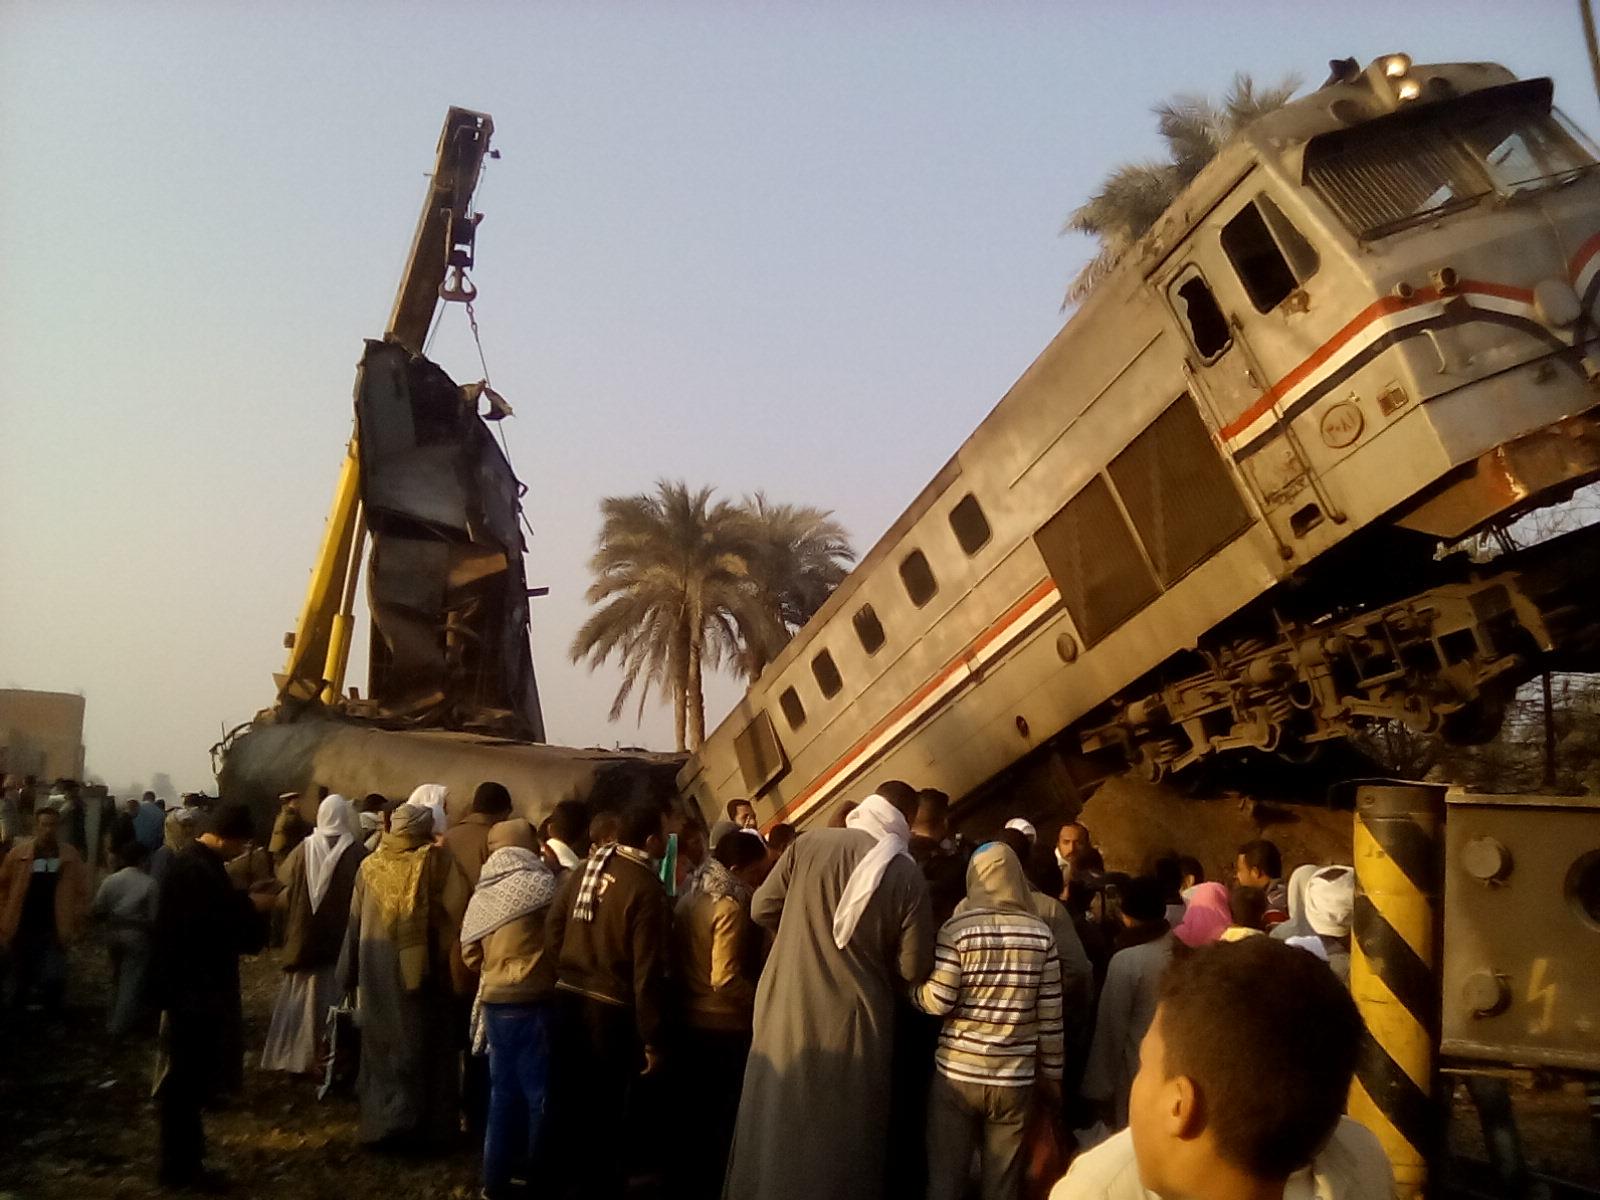 The site of a train crash in Egypt's Beni Suef province, February 11, 2016 (Photo: Aswat Masriya)